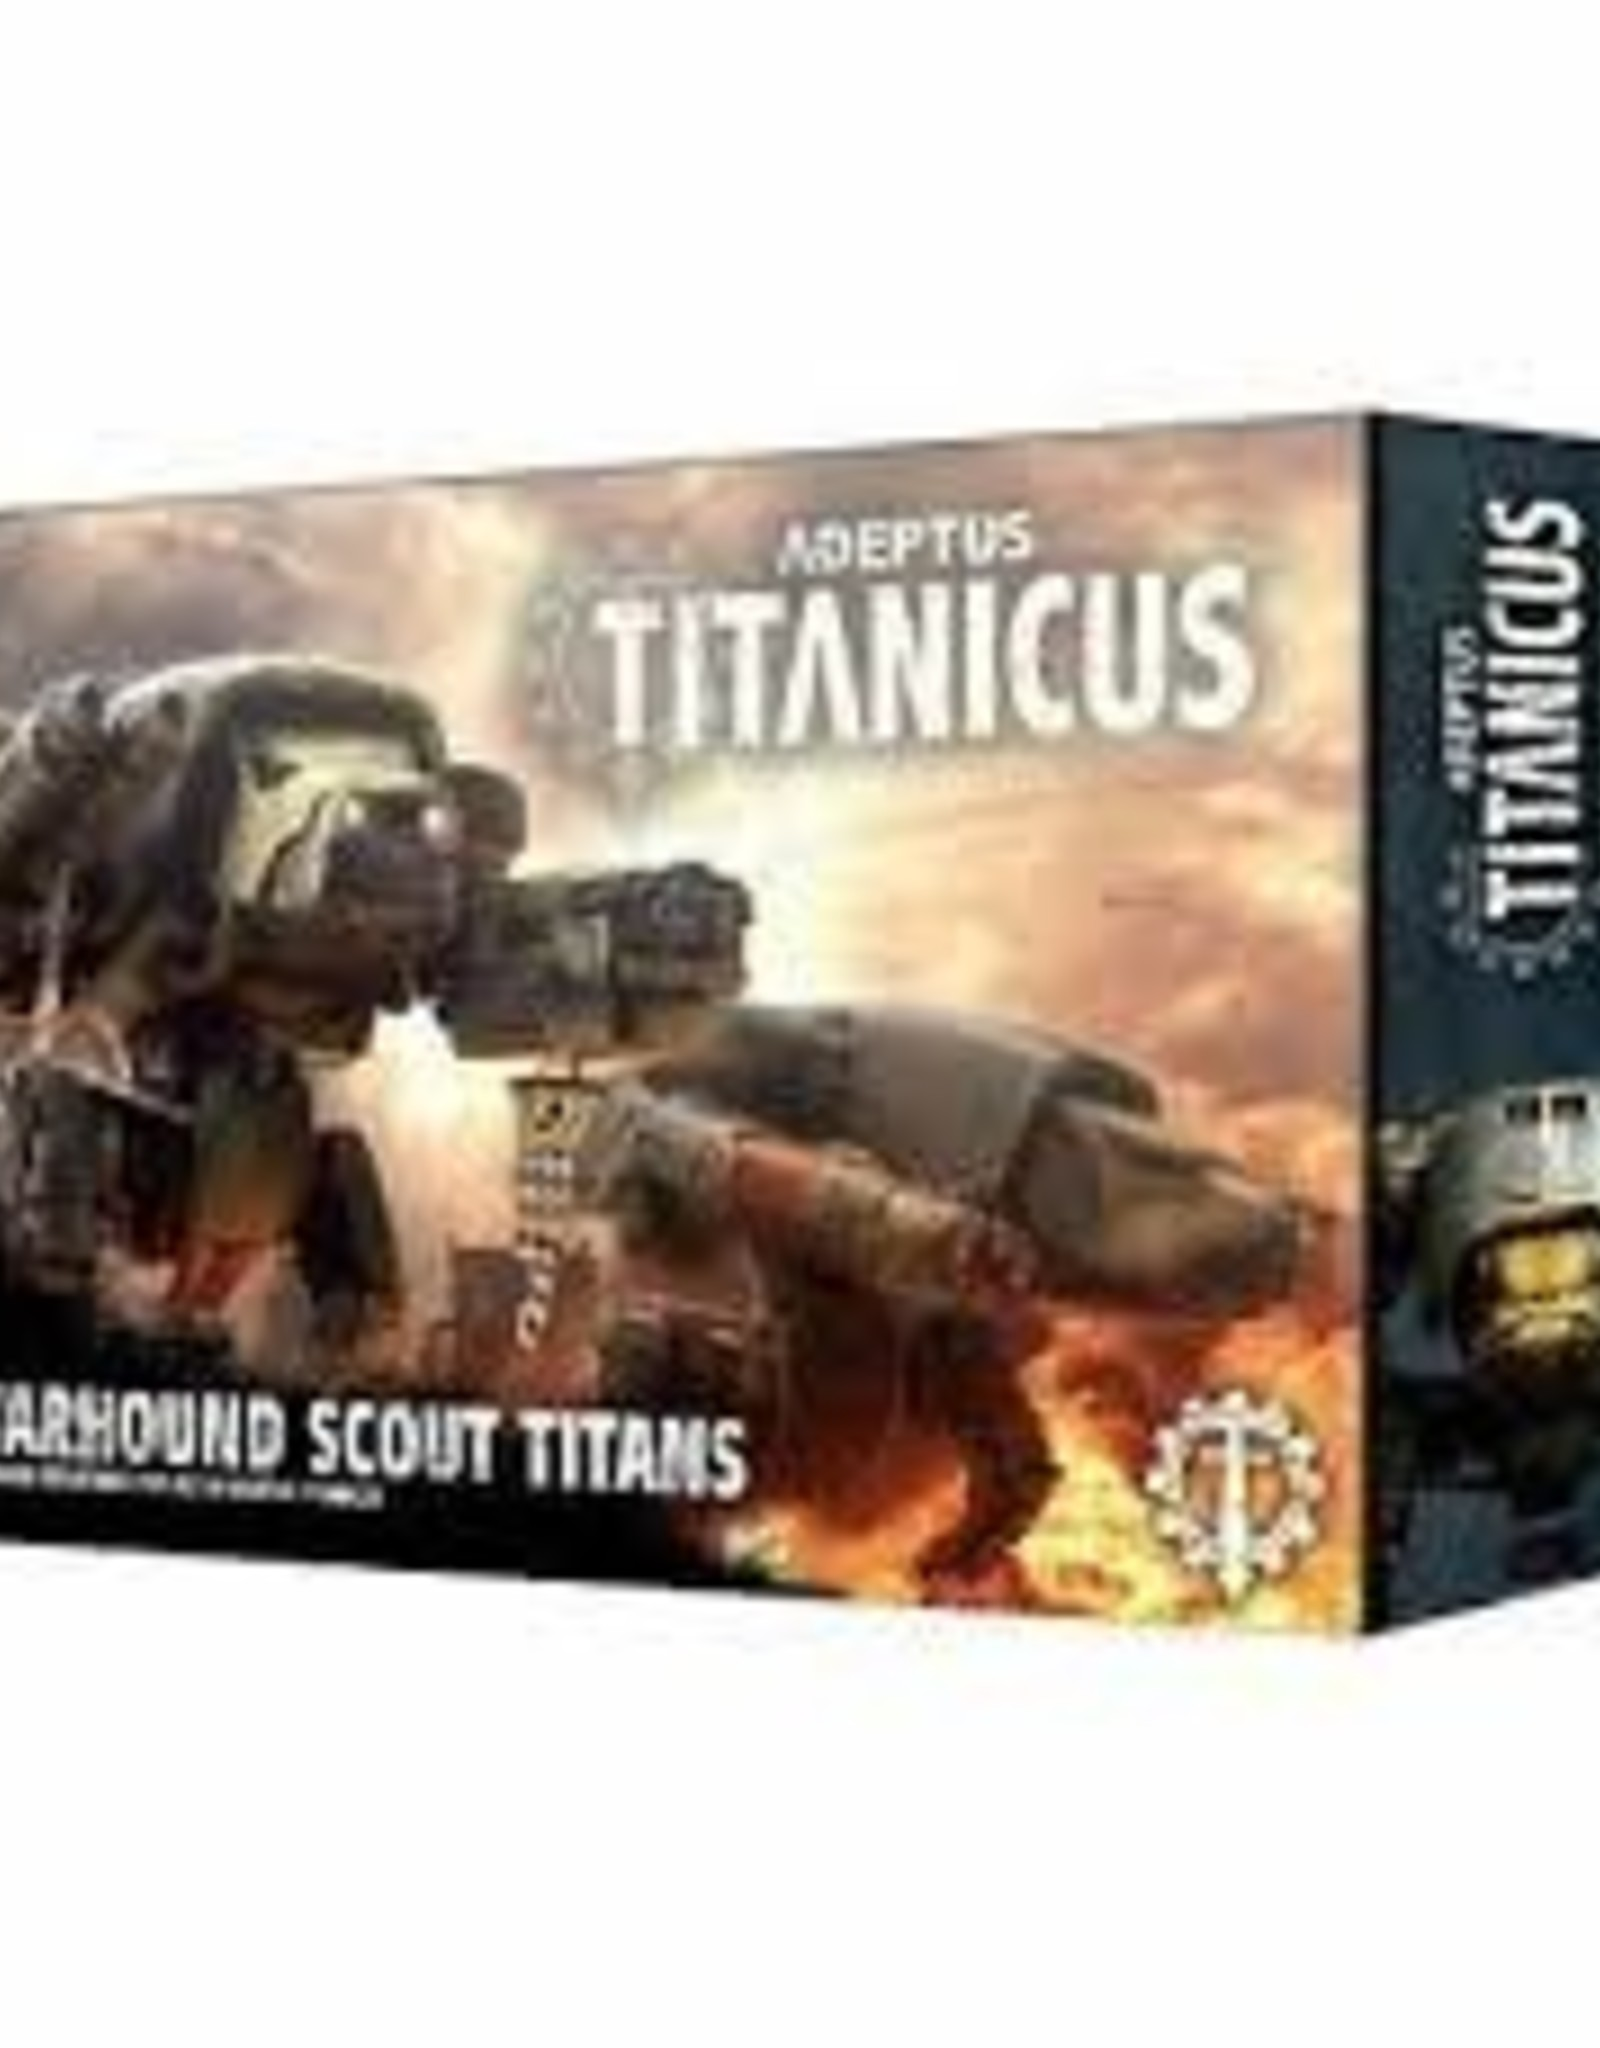 Games Workshop Adeptus Titanicus Warhound Scout Titans